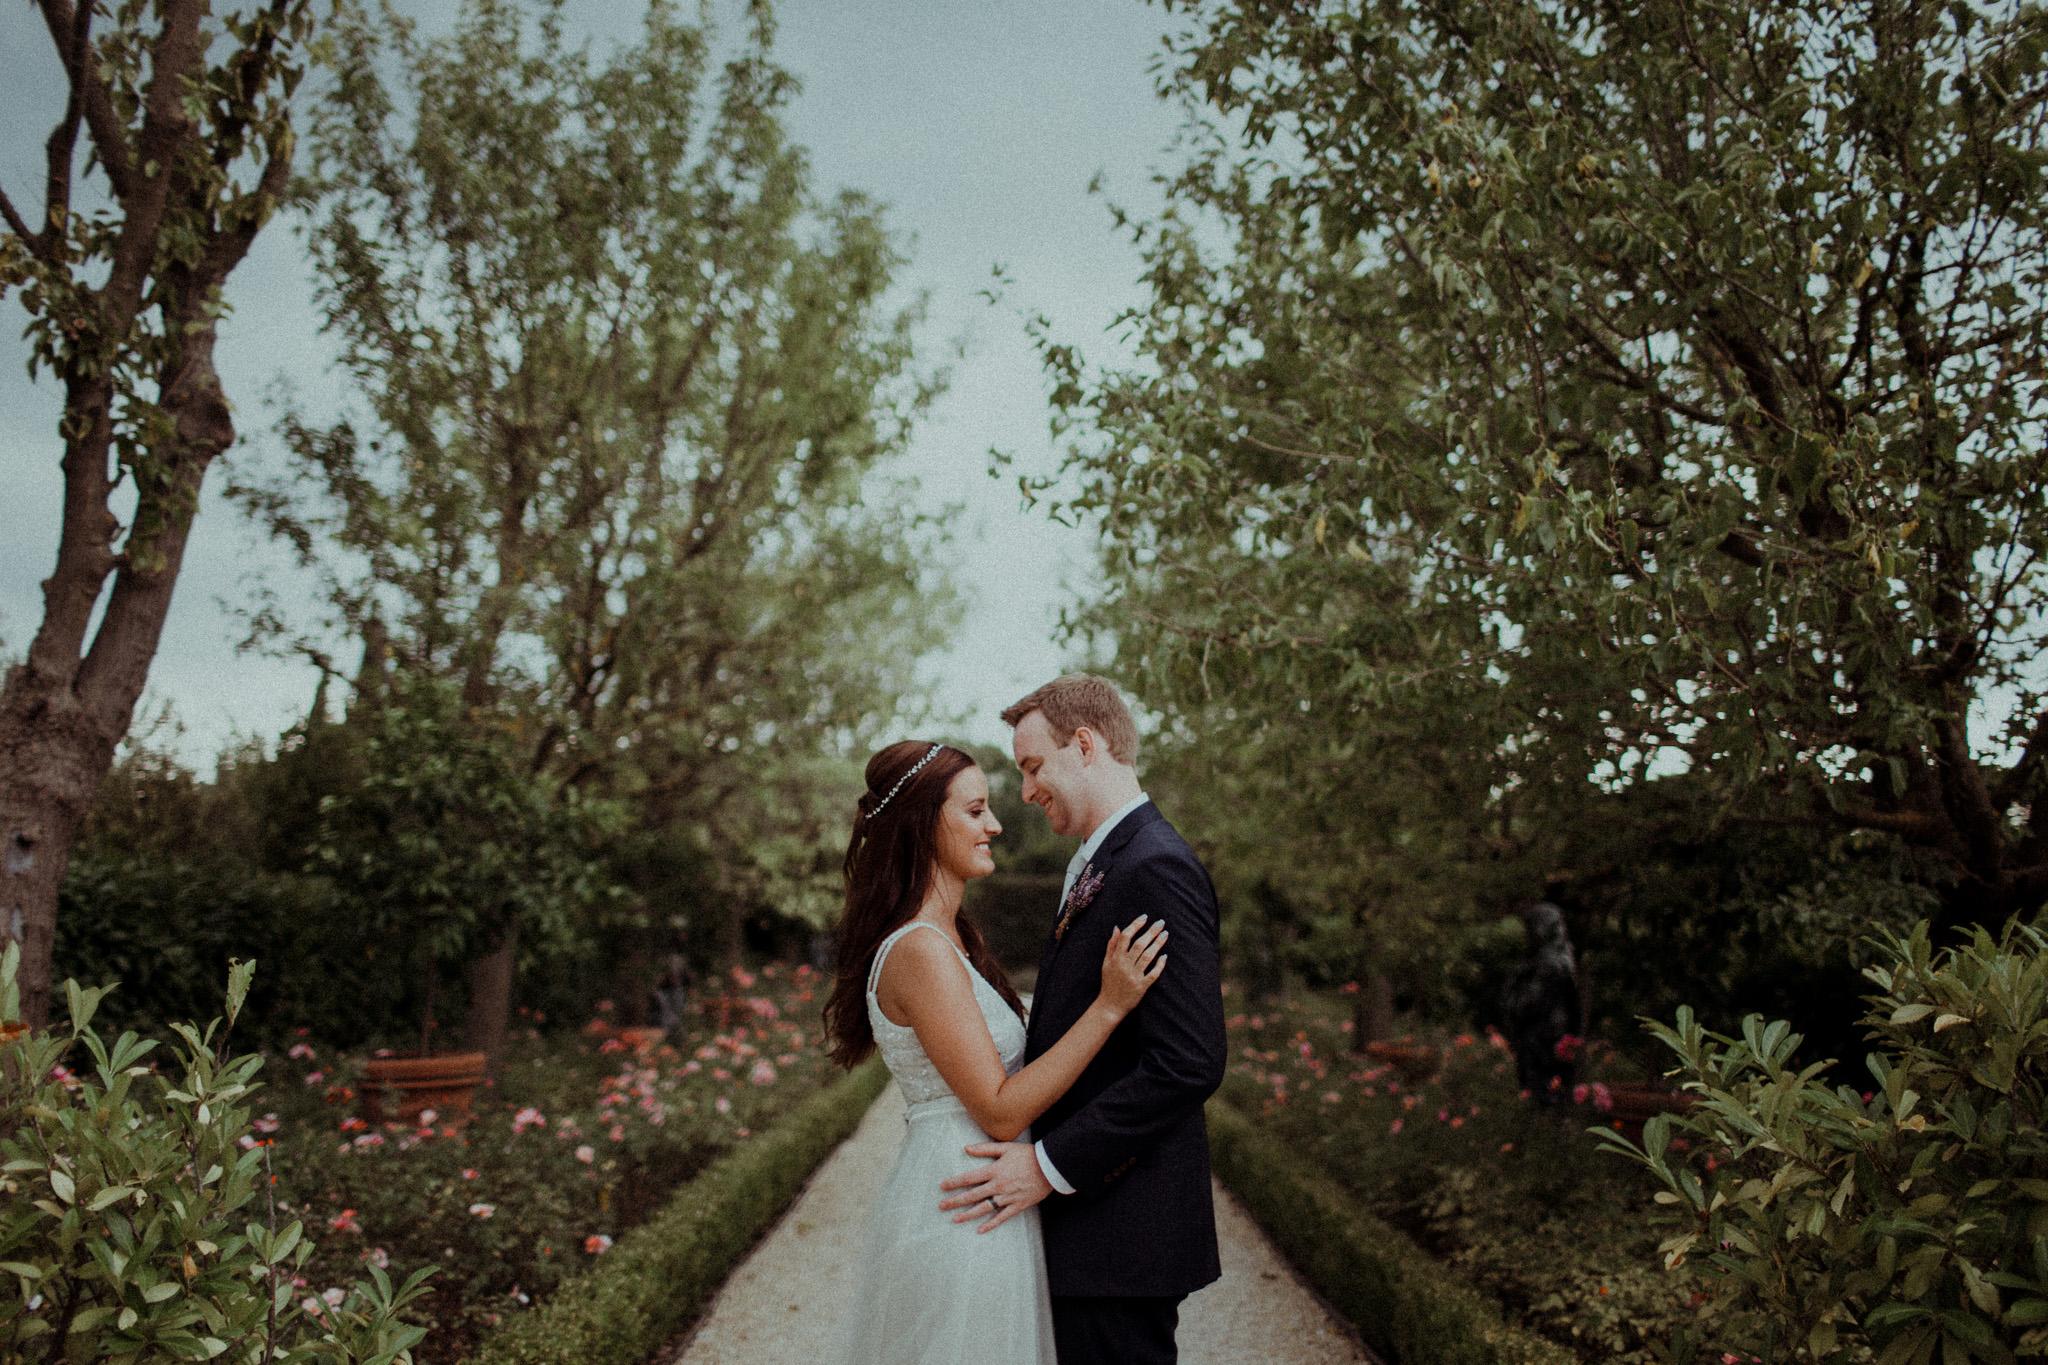 BOHO-ITALIAN-WEDDING-IN-TUSCANY-51.jpg